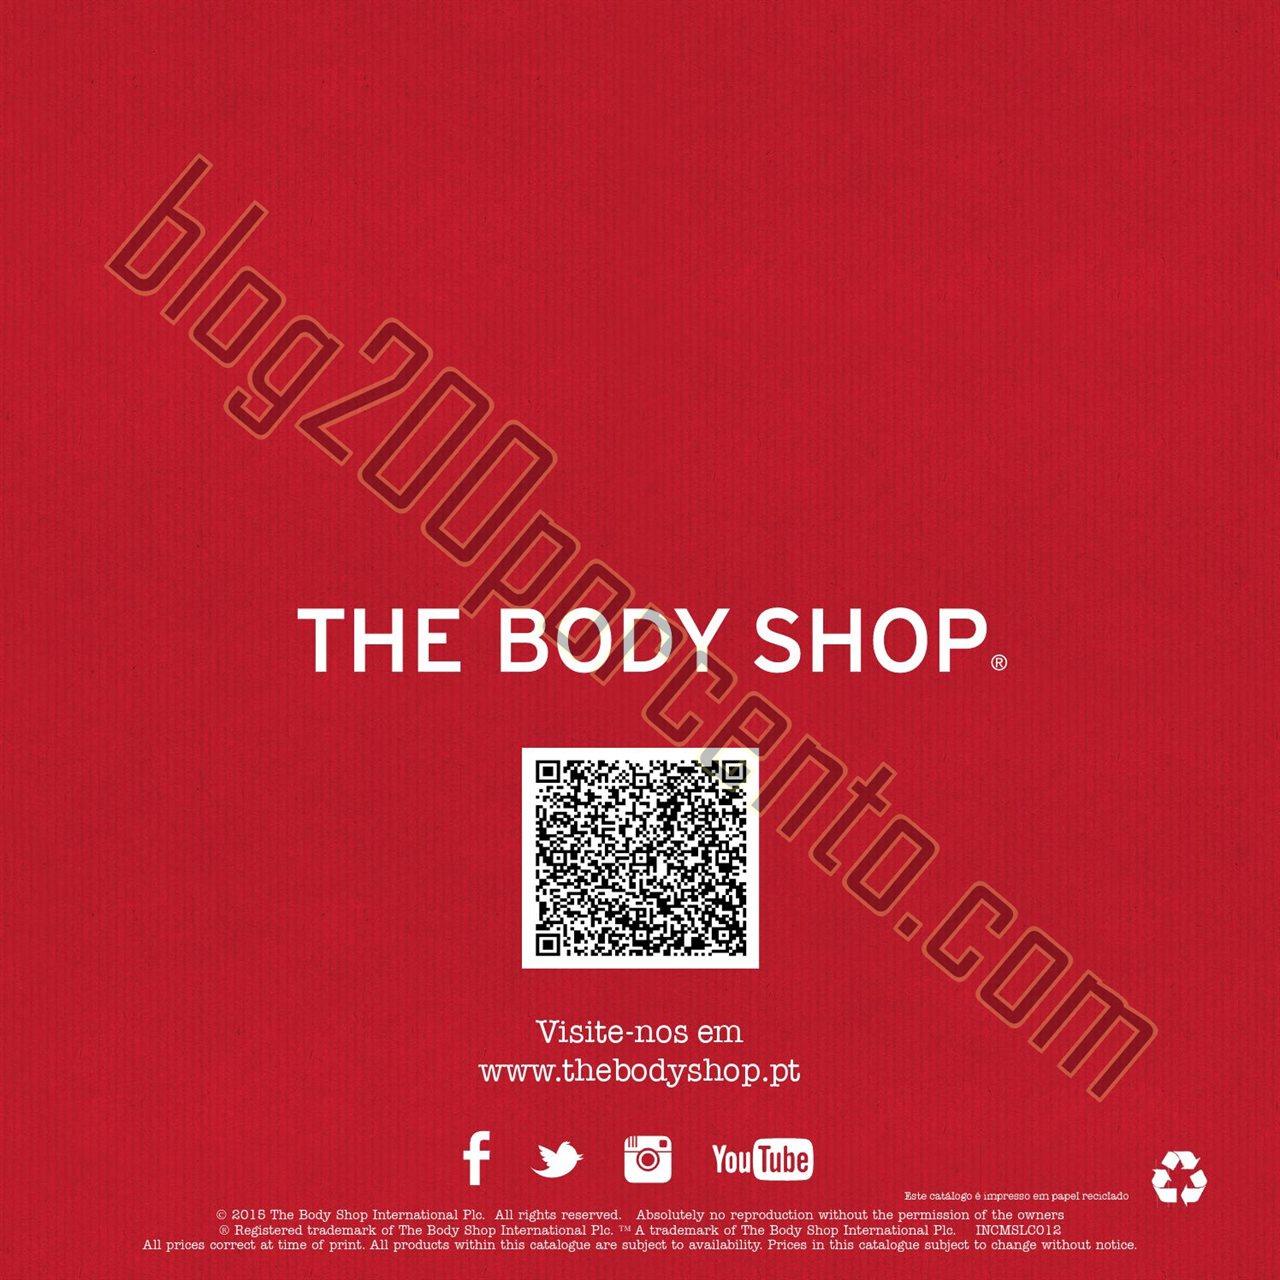 Novo Folheto THE BODY SHOP Natal 2015 p24.jpg